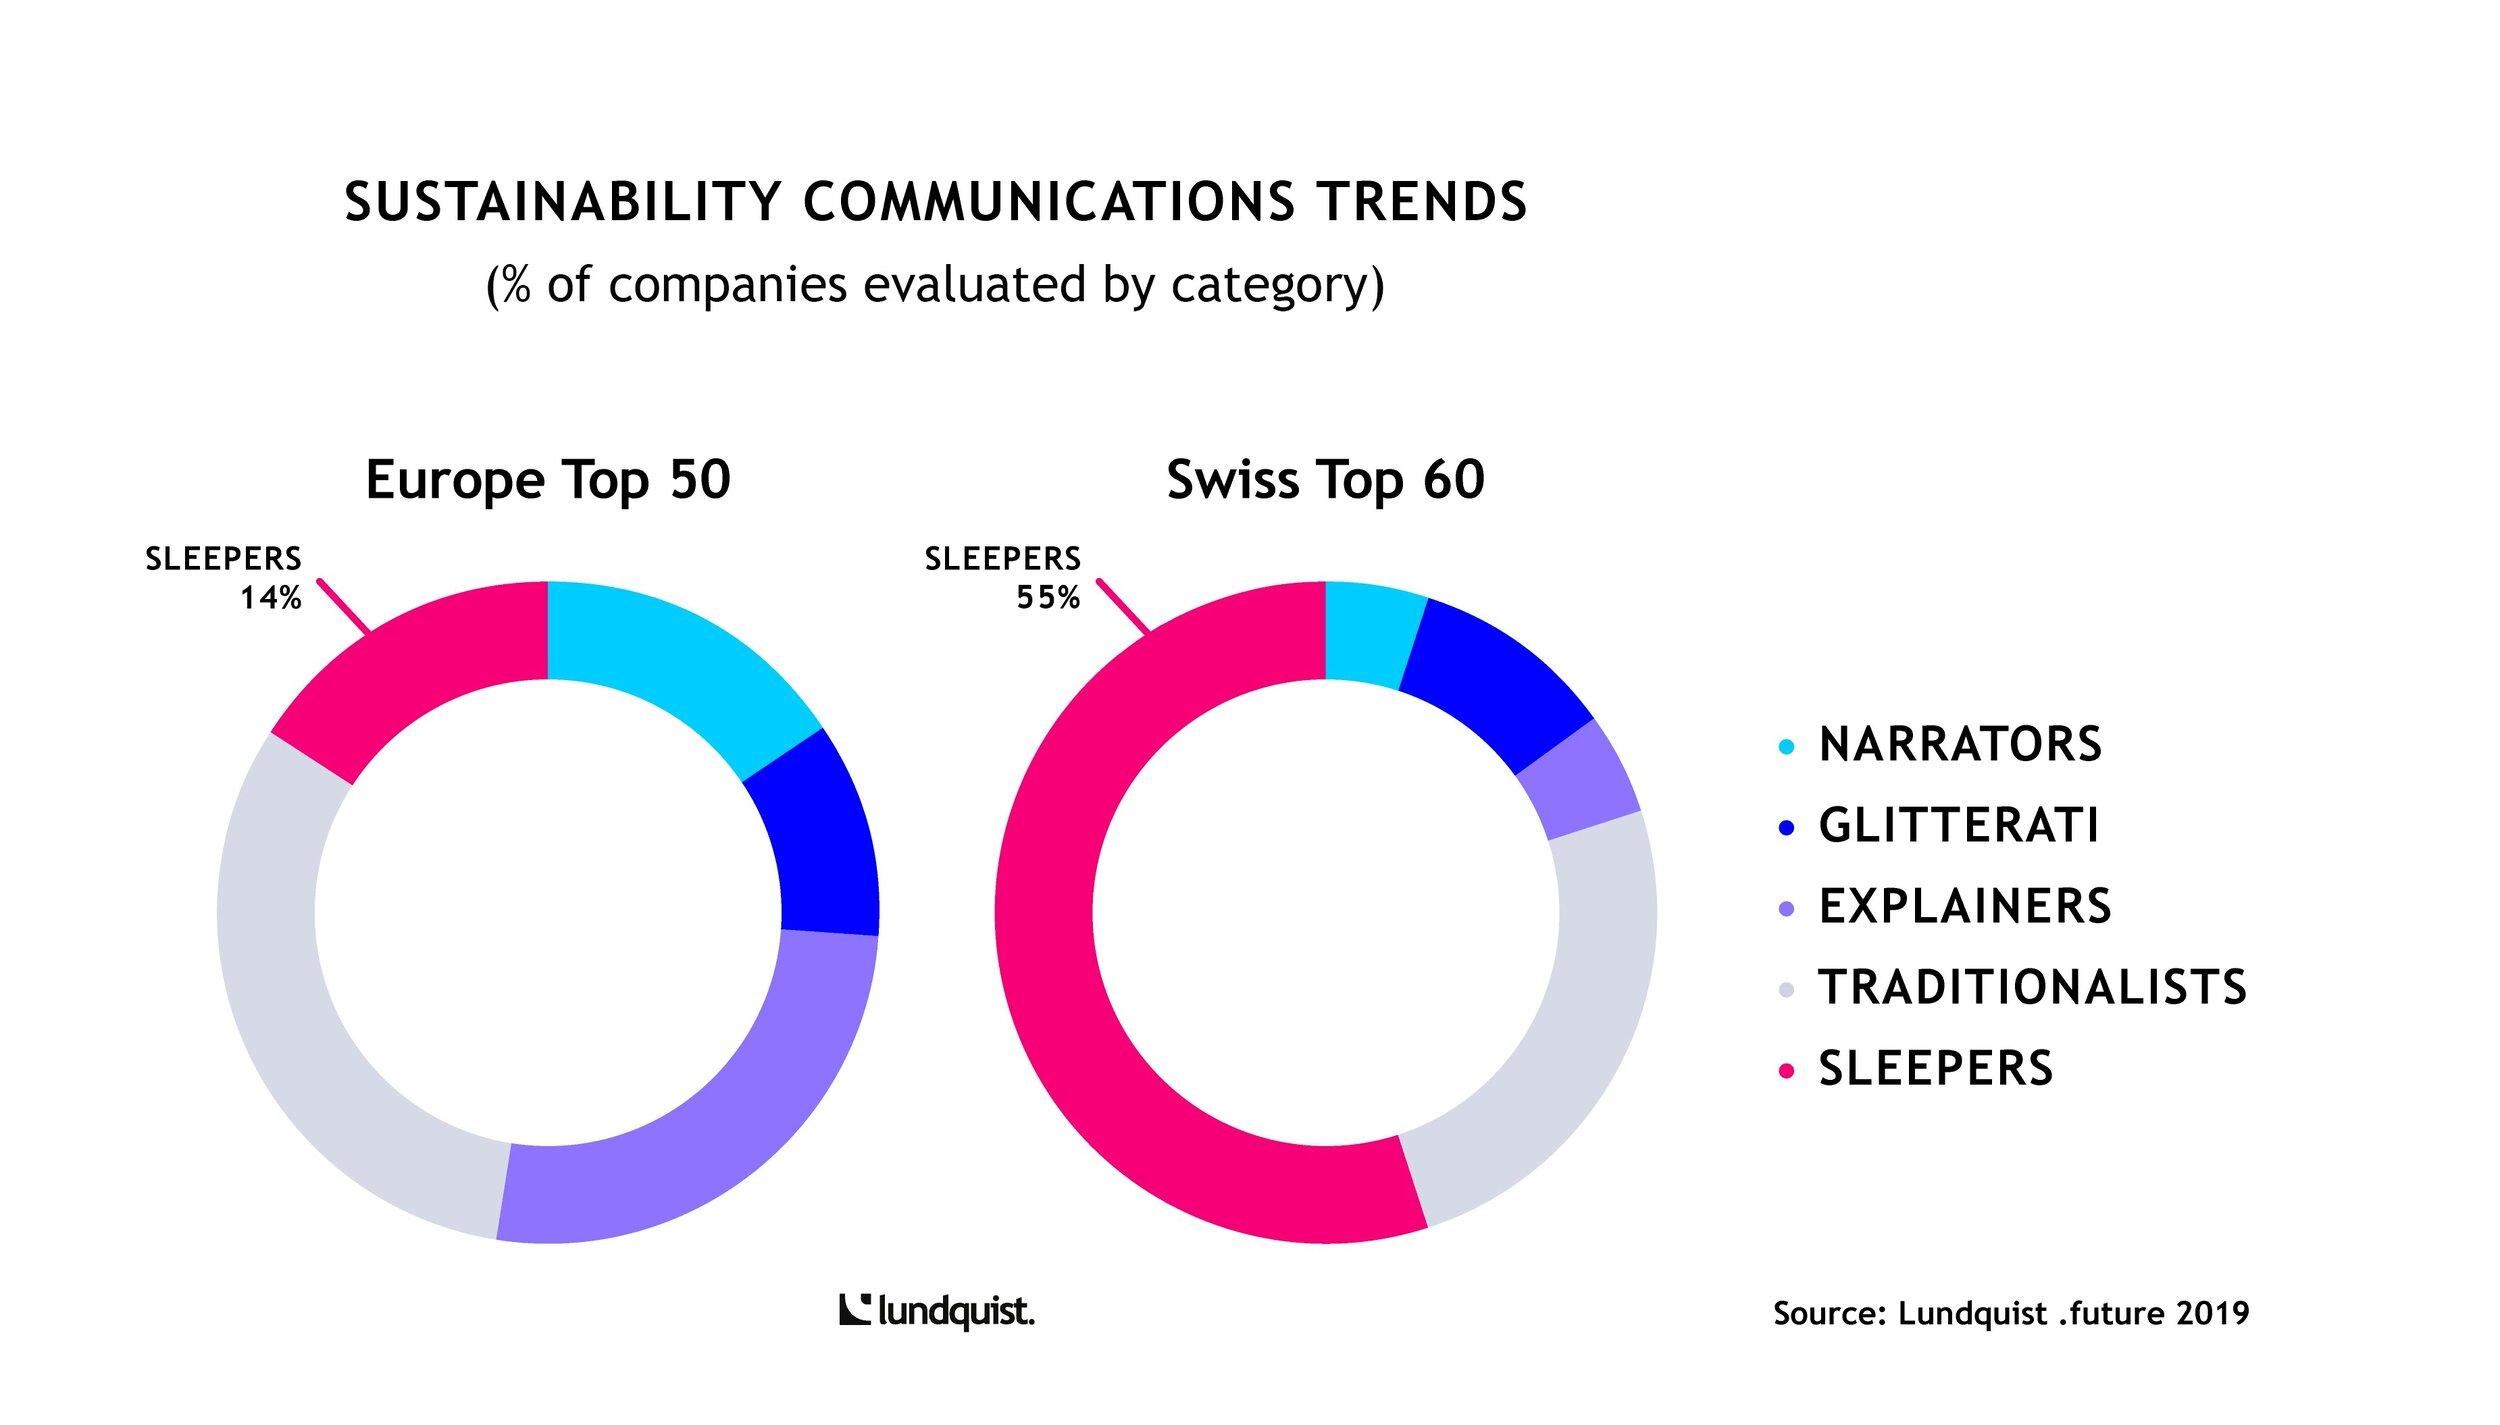 Grafik Sustainability Communications Trends Lundquist.jpg